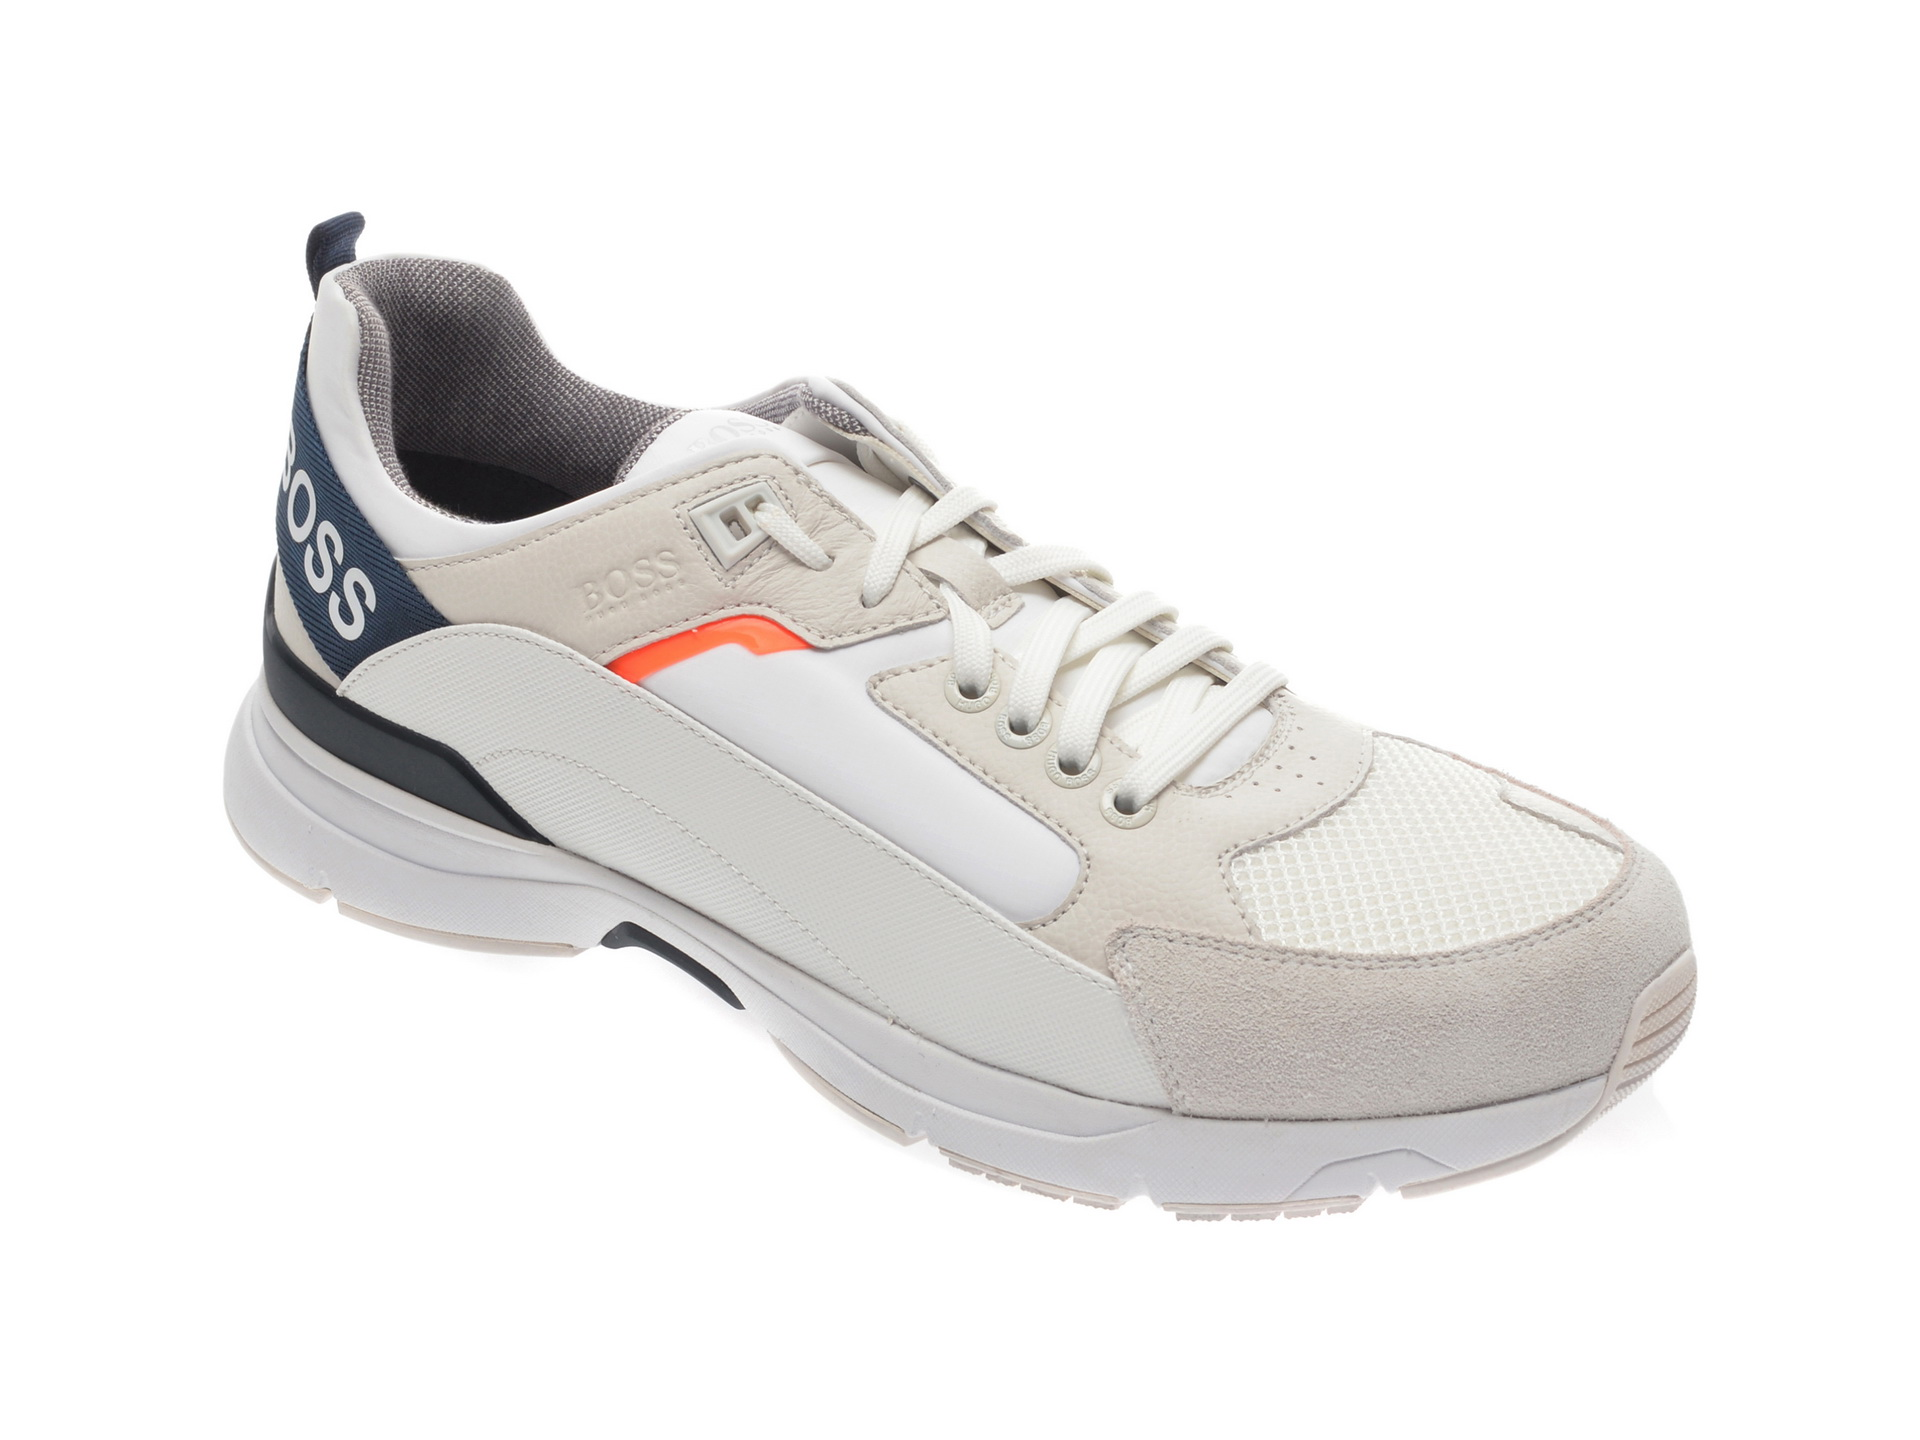 Pantofi sport HUGO BOSS albi, 8547, din material textil si piele naturala